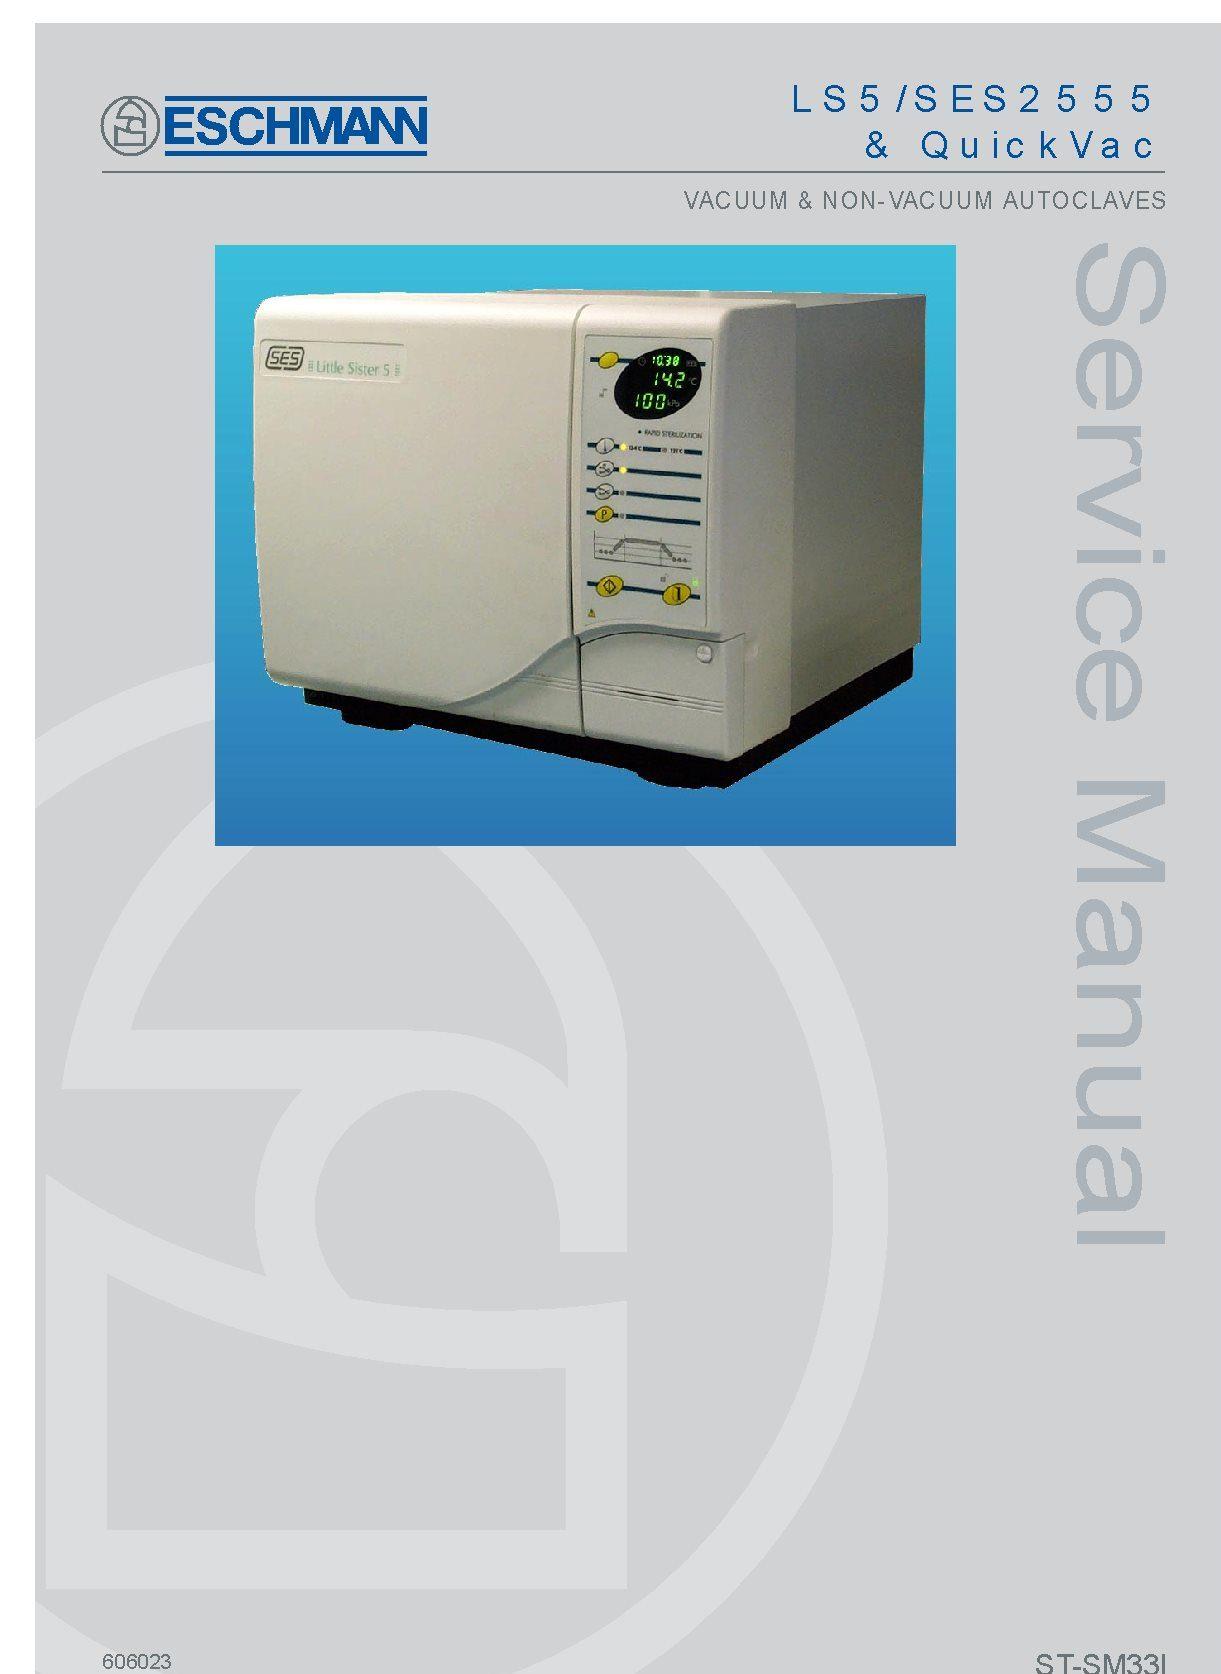 Eschmann Little Sister 5, SES2555, QuickVac Service manual